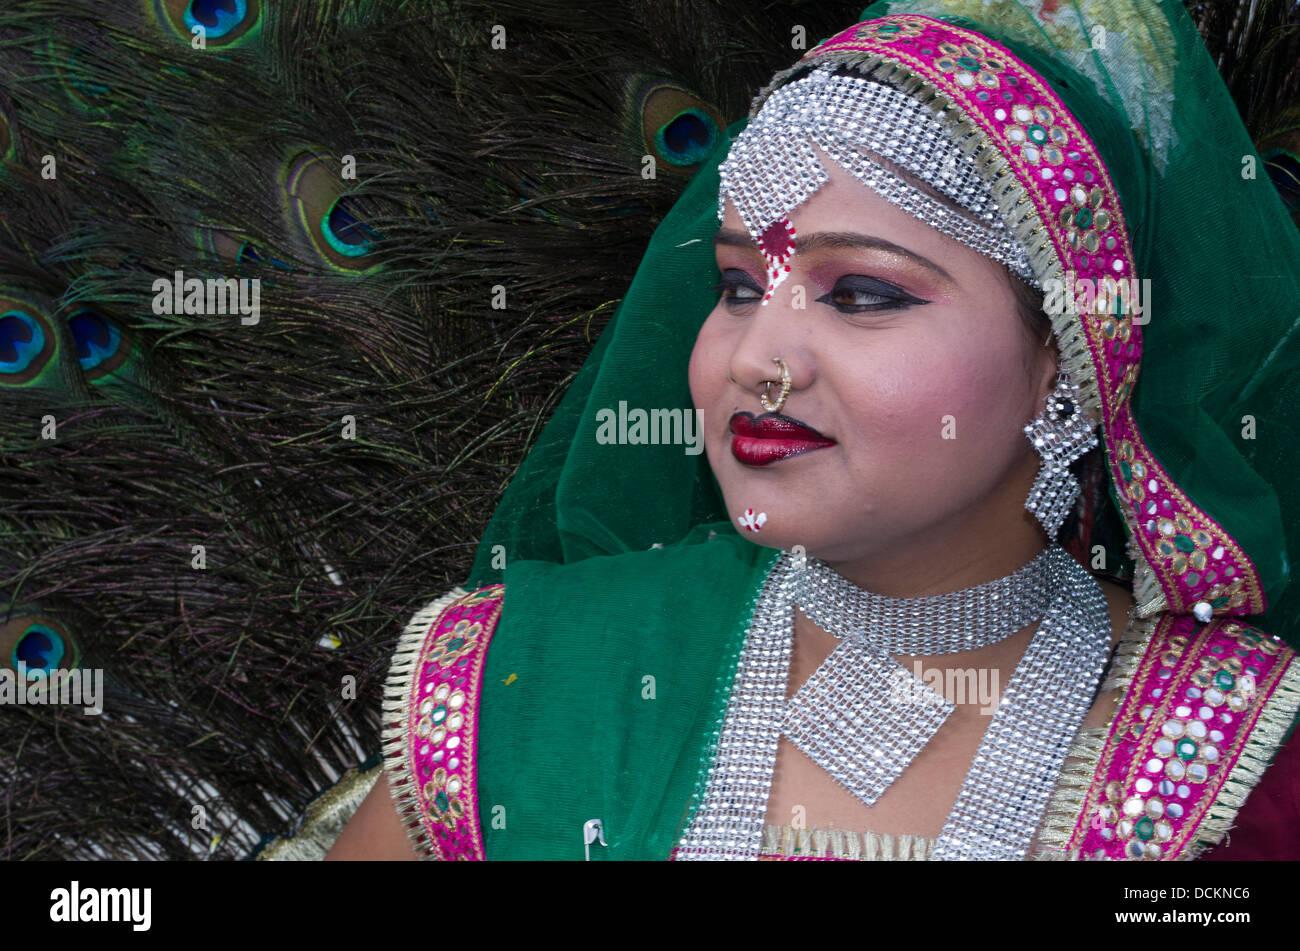 Rajasthani bailarina folklórica Jaipur, Rajasthan, India Imagen De Stock